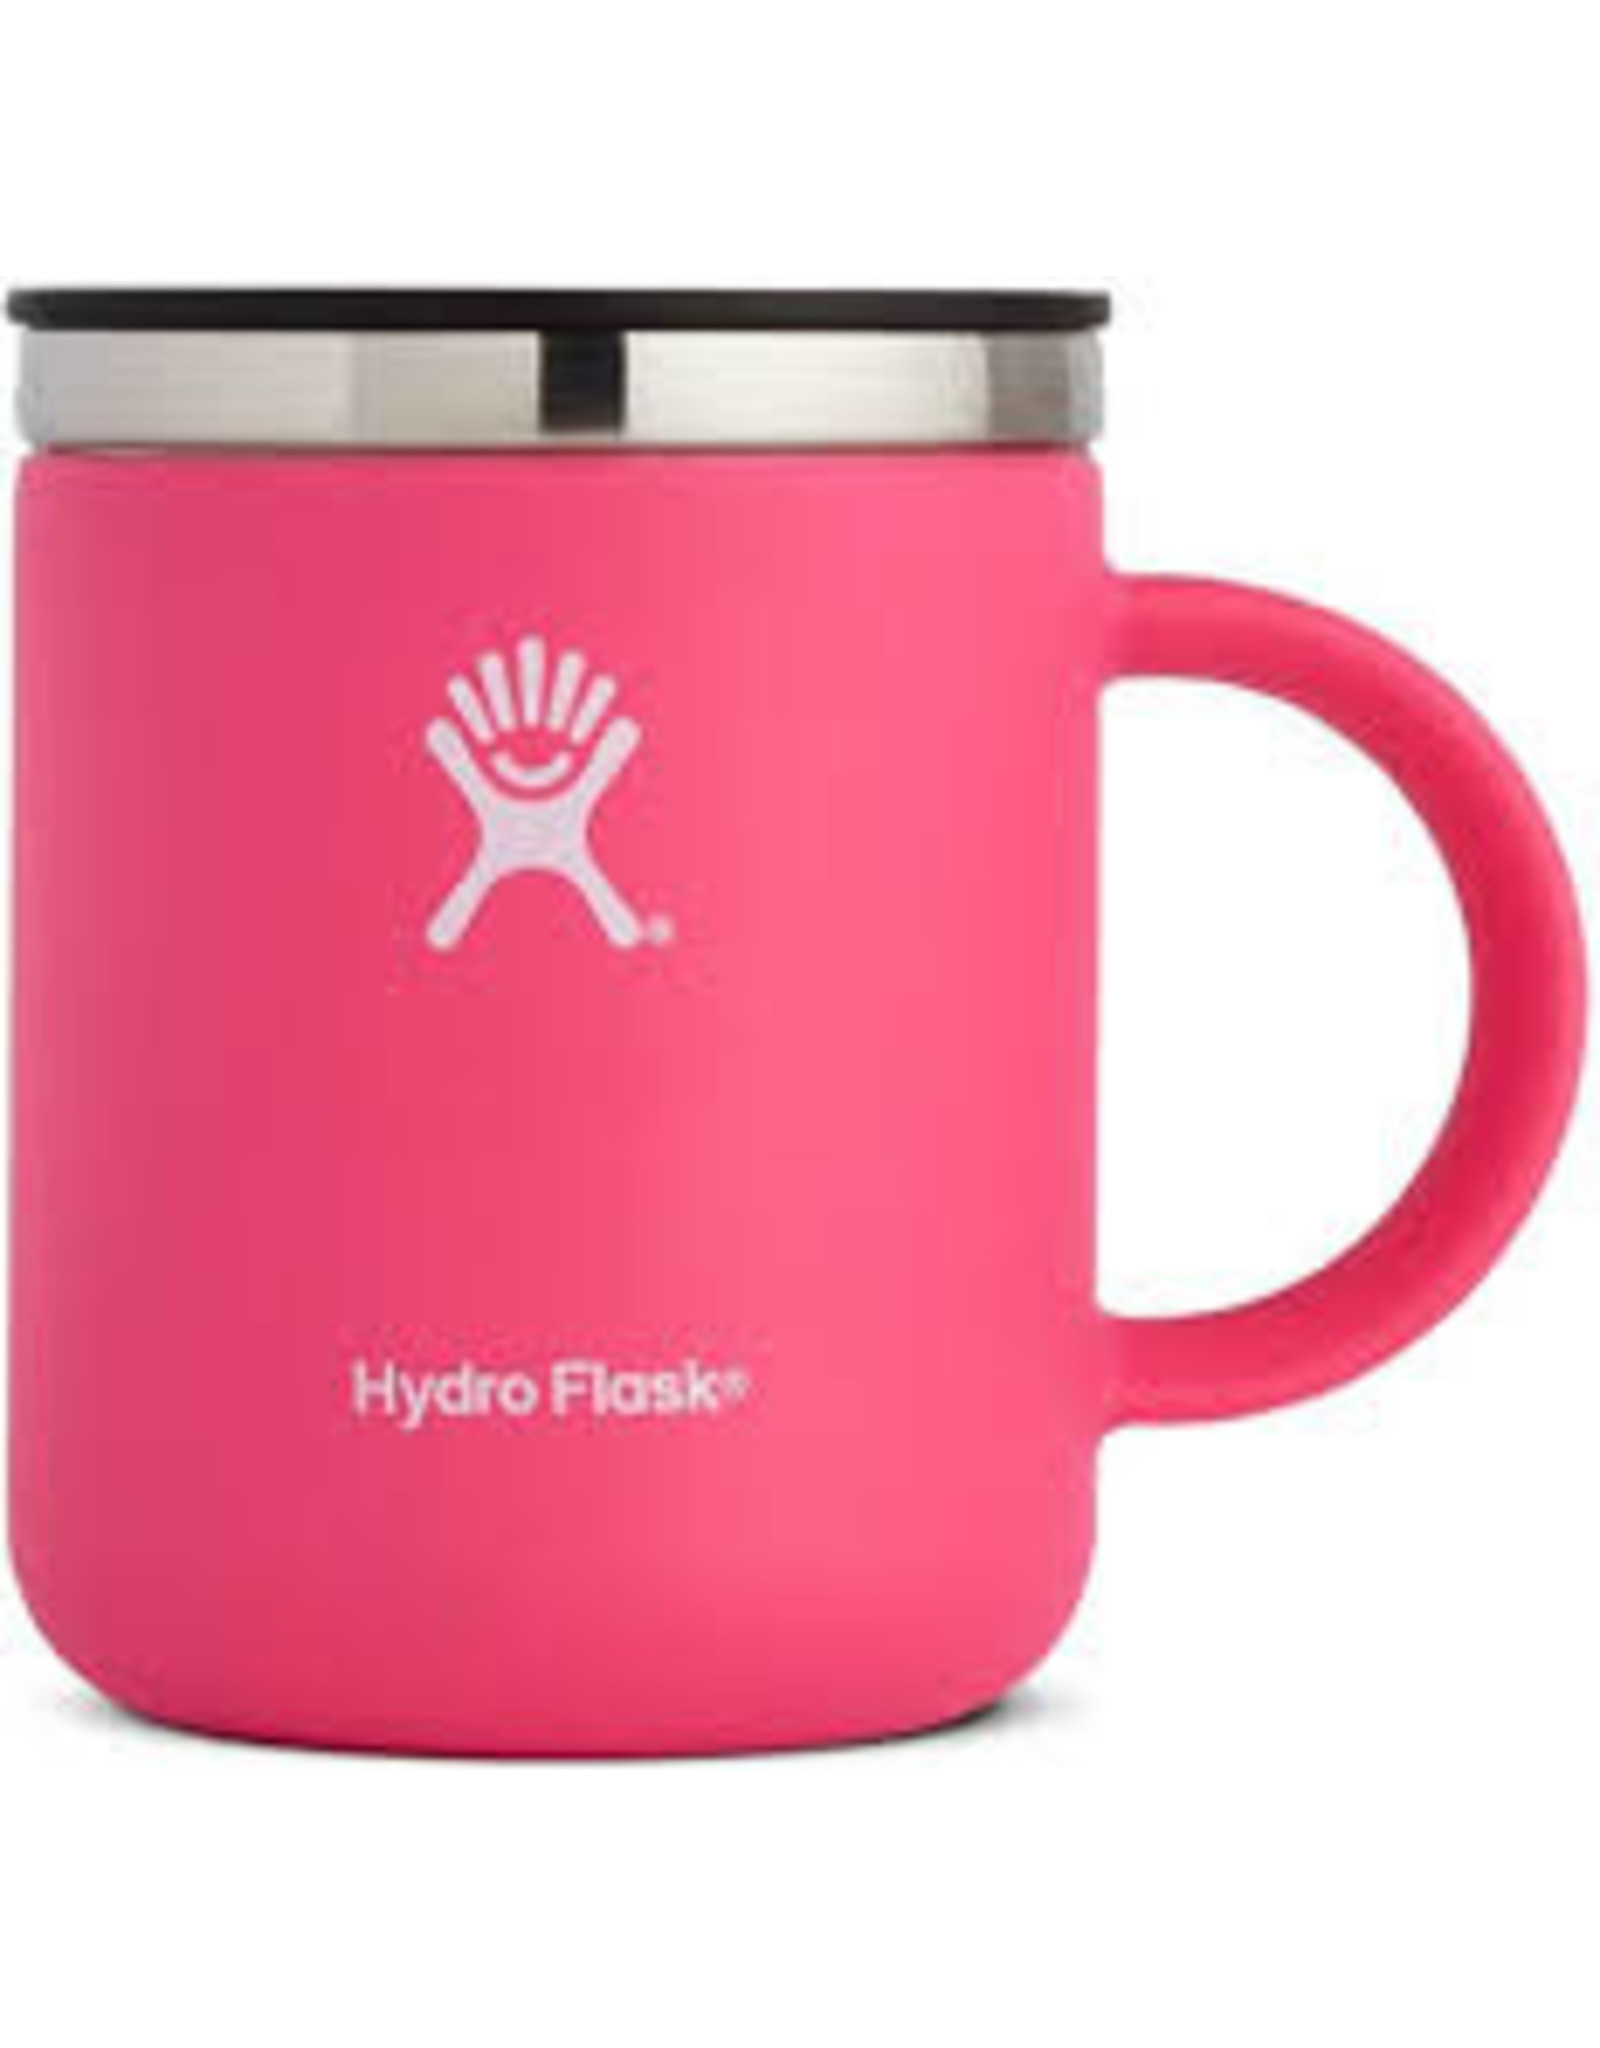 Hydro Flask Hydro Flask - Coffee Mug